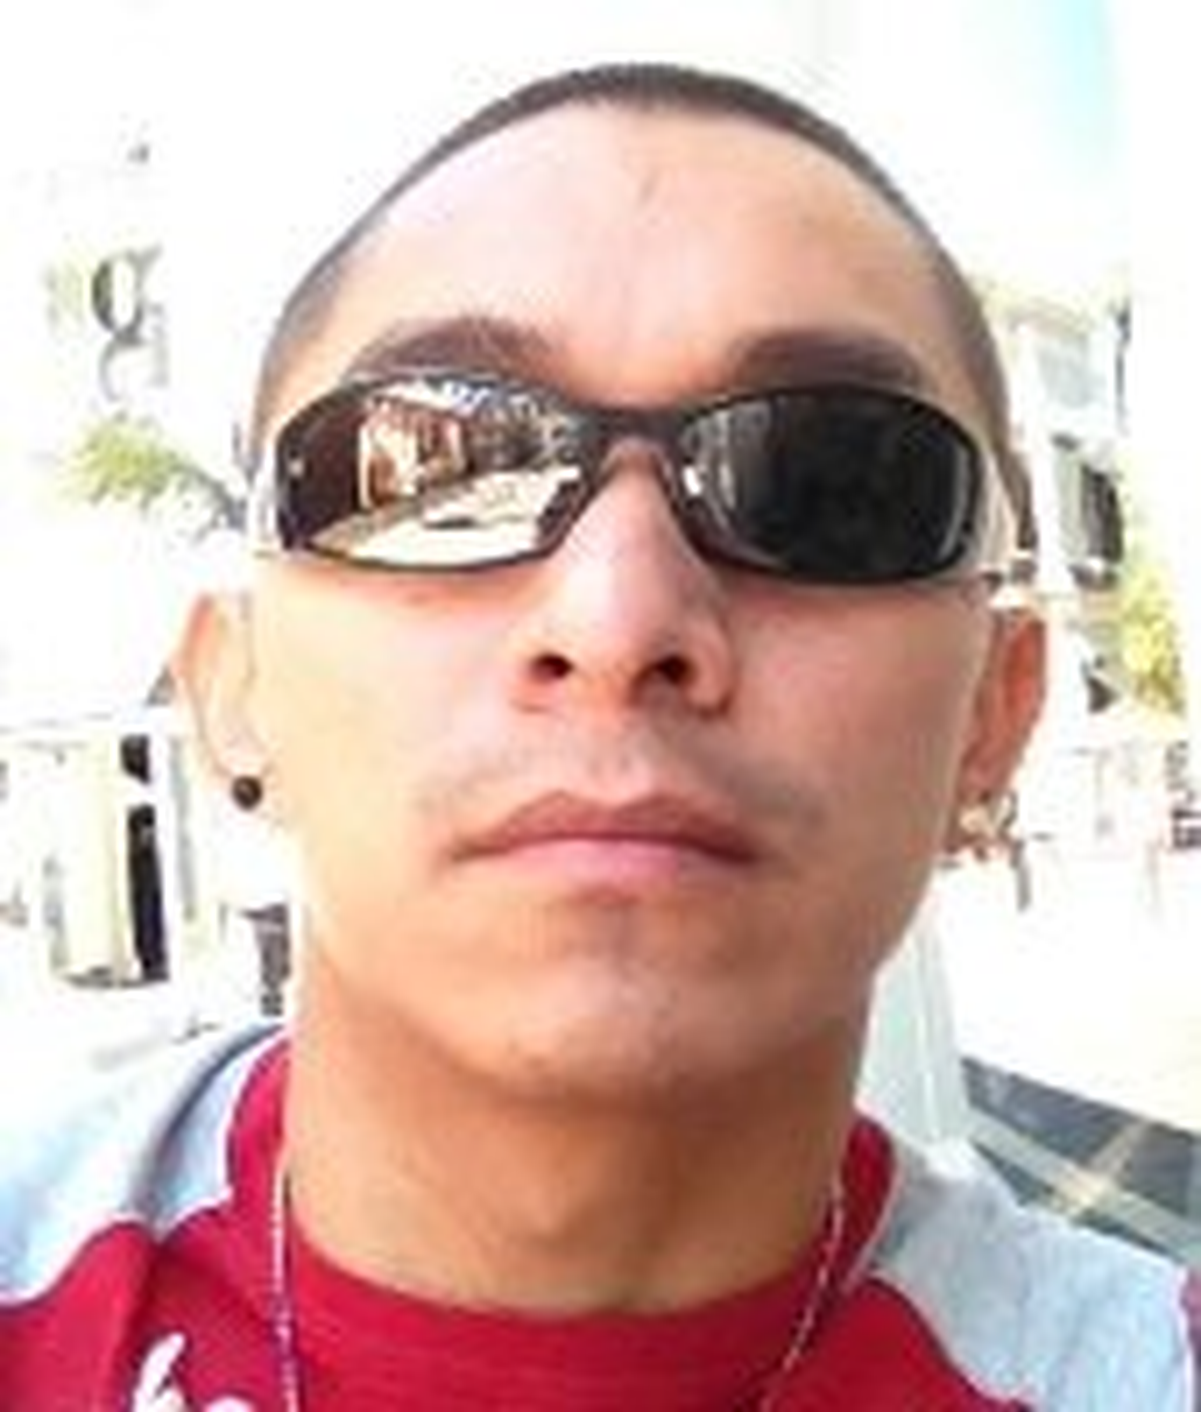 Robby Mendez